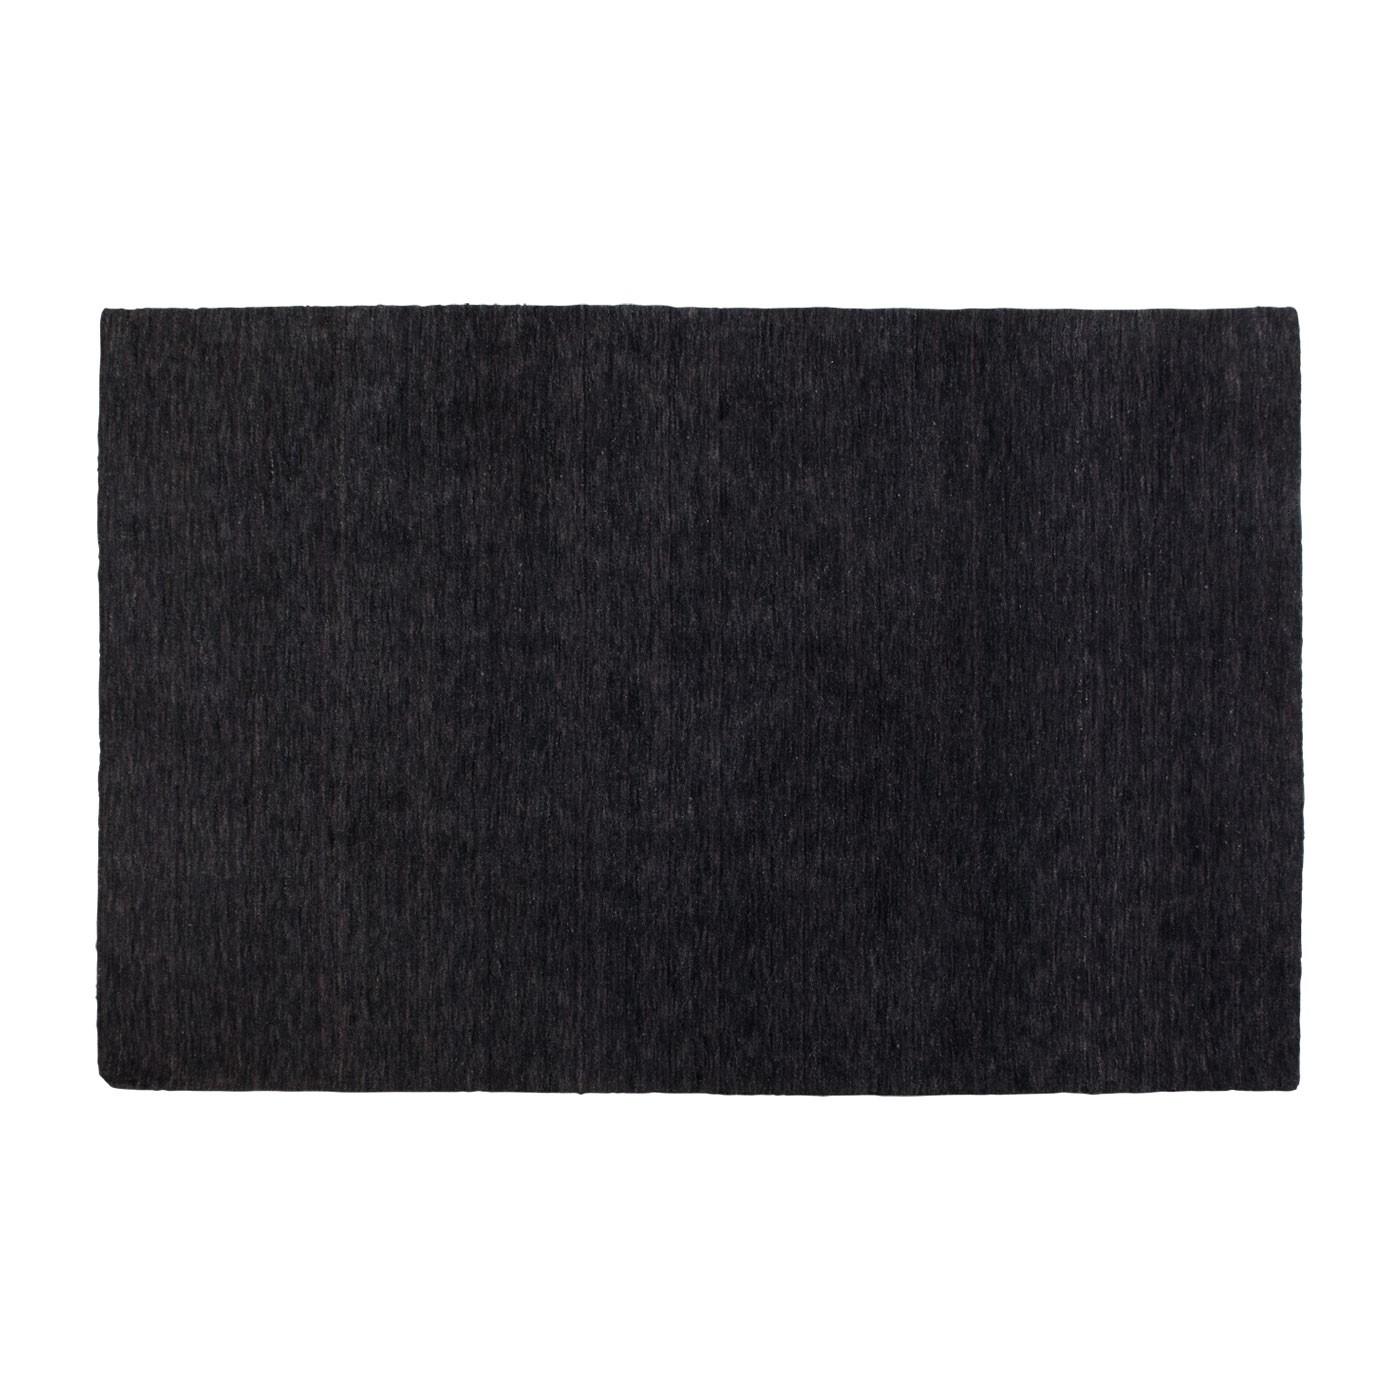 black rugs submit. VWFRDZP